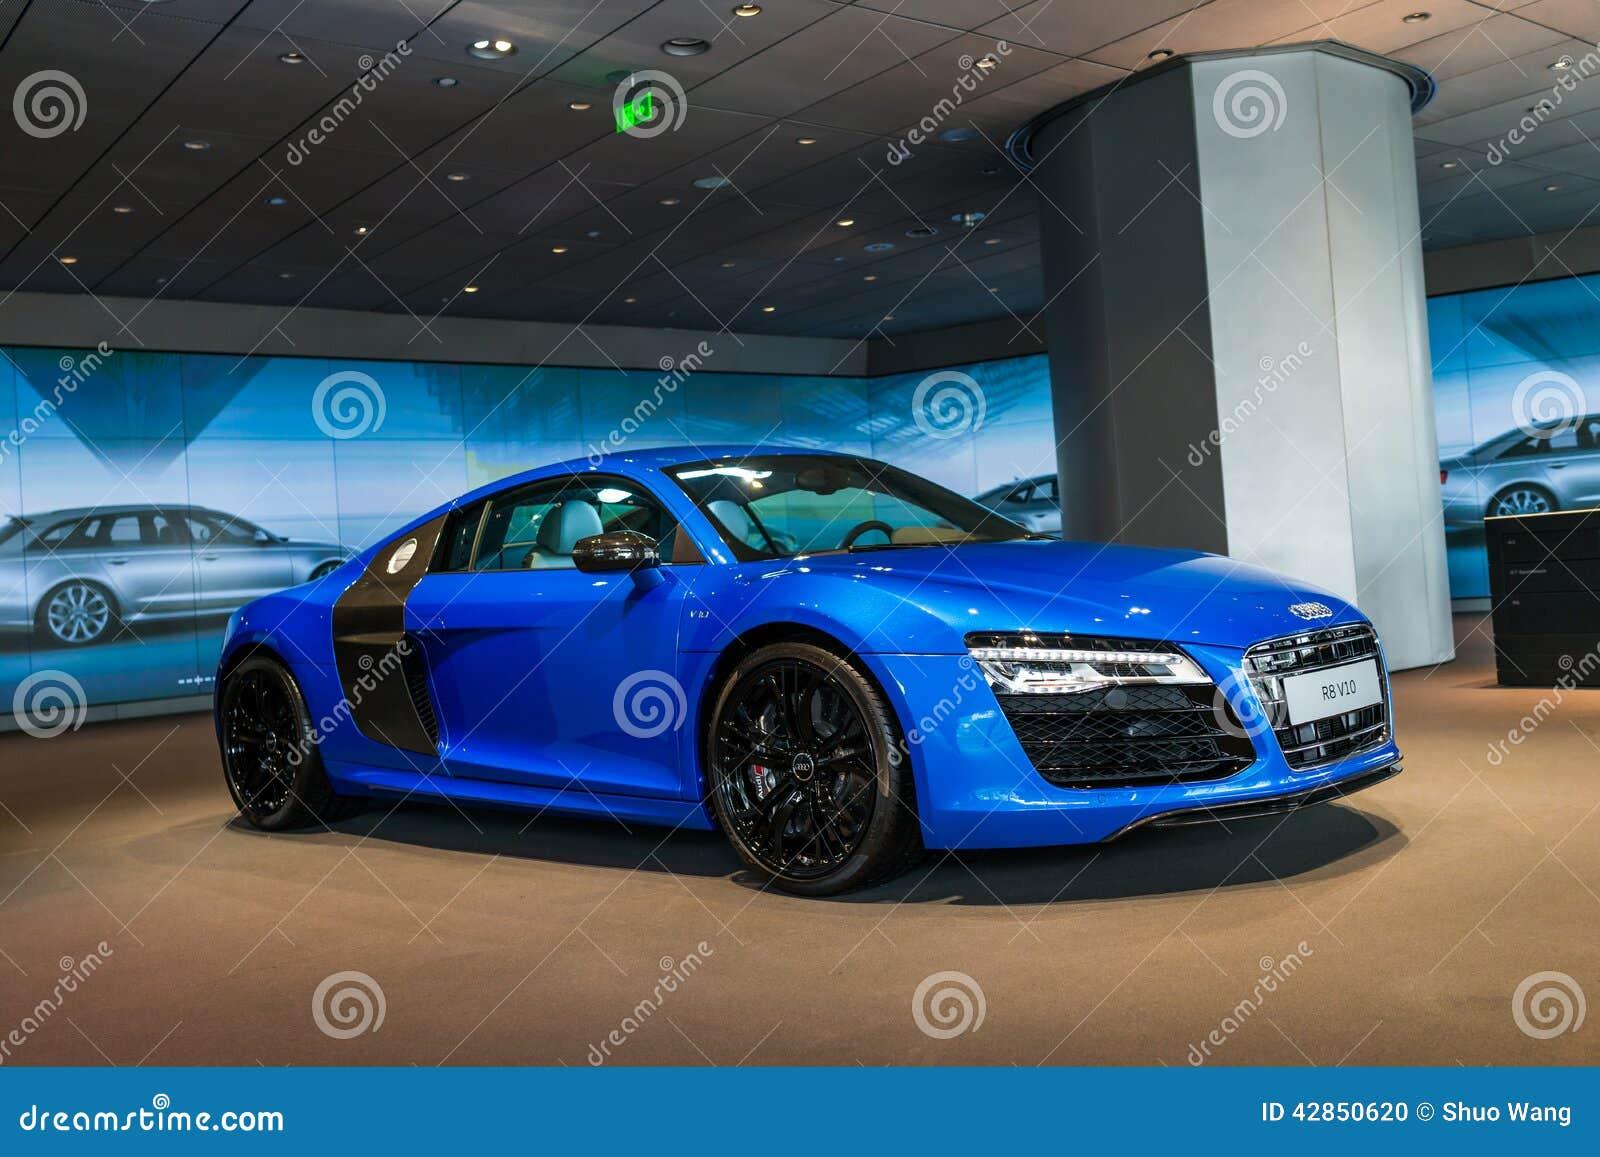 Parking Garage Floor Plans Sports Car For Sale Audi R8 Editorial Image Image 42850620